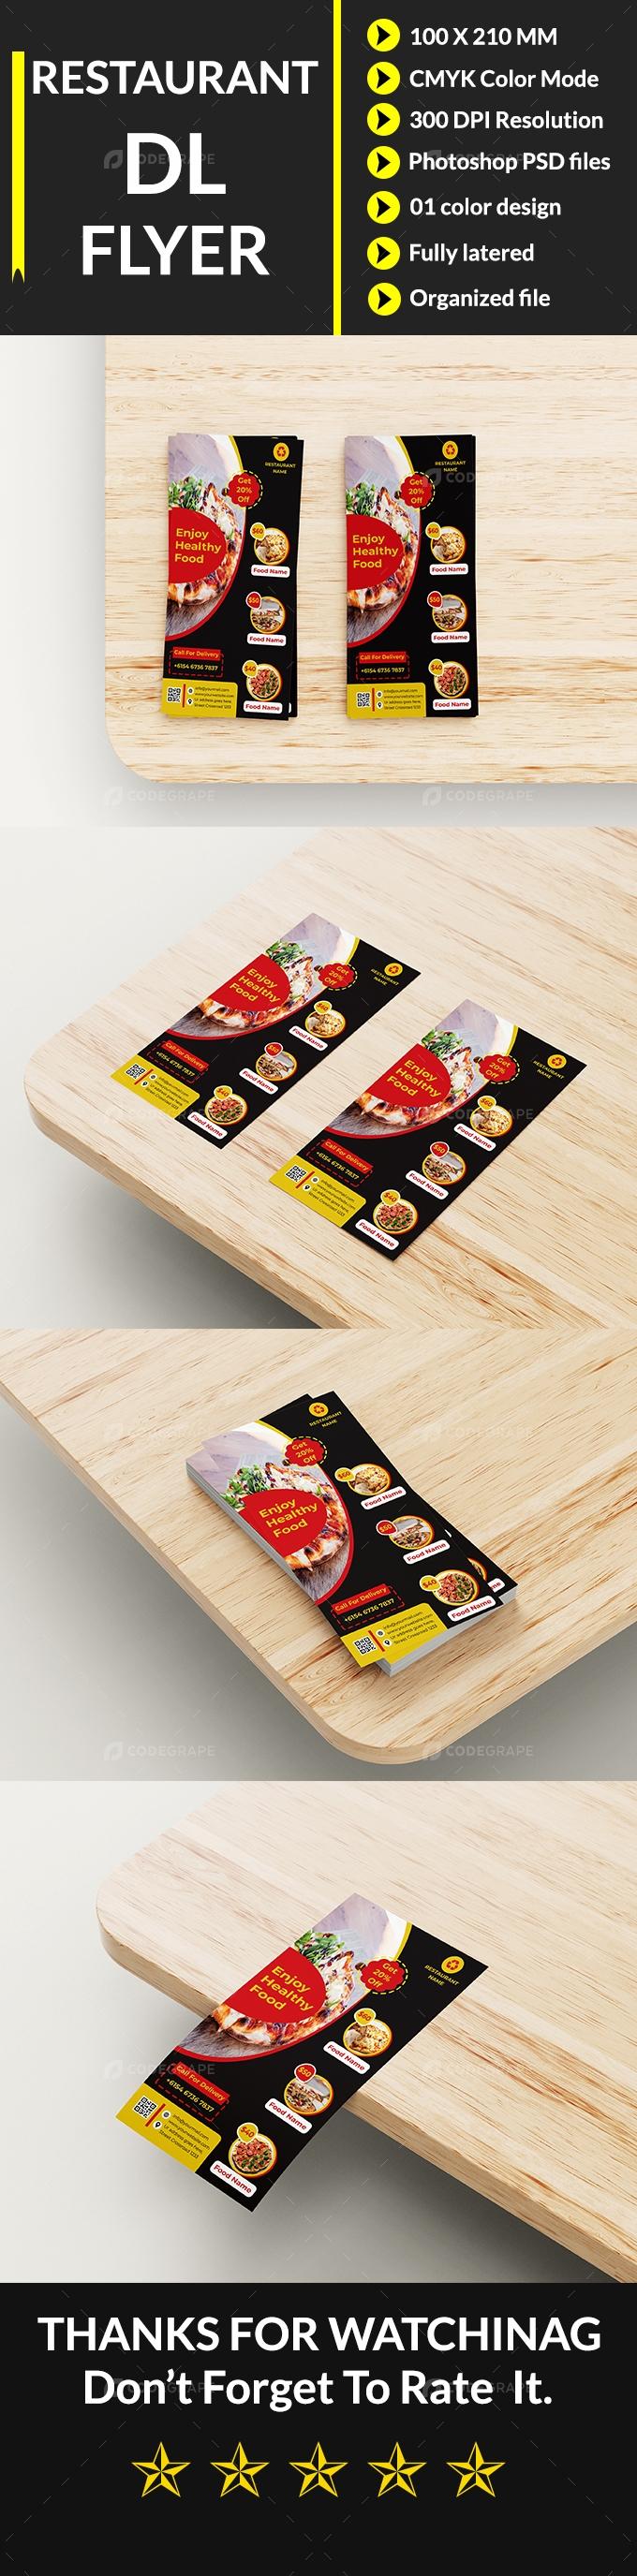 Restaurant DL Flyer